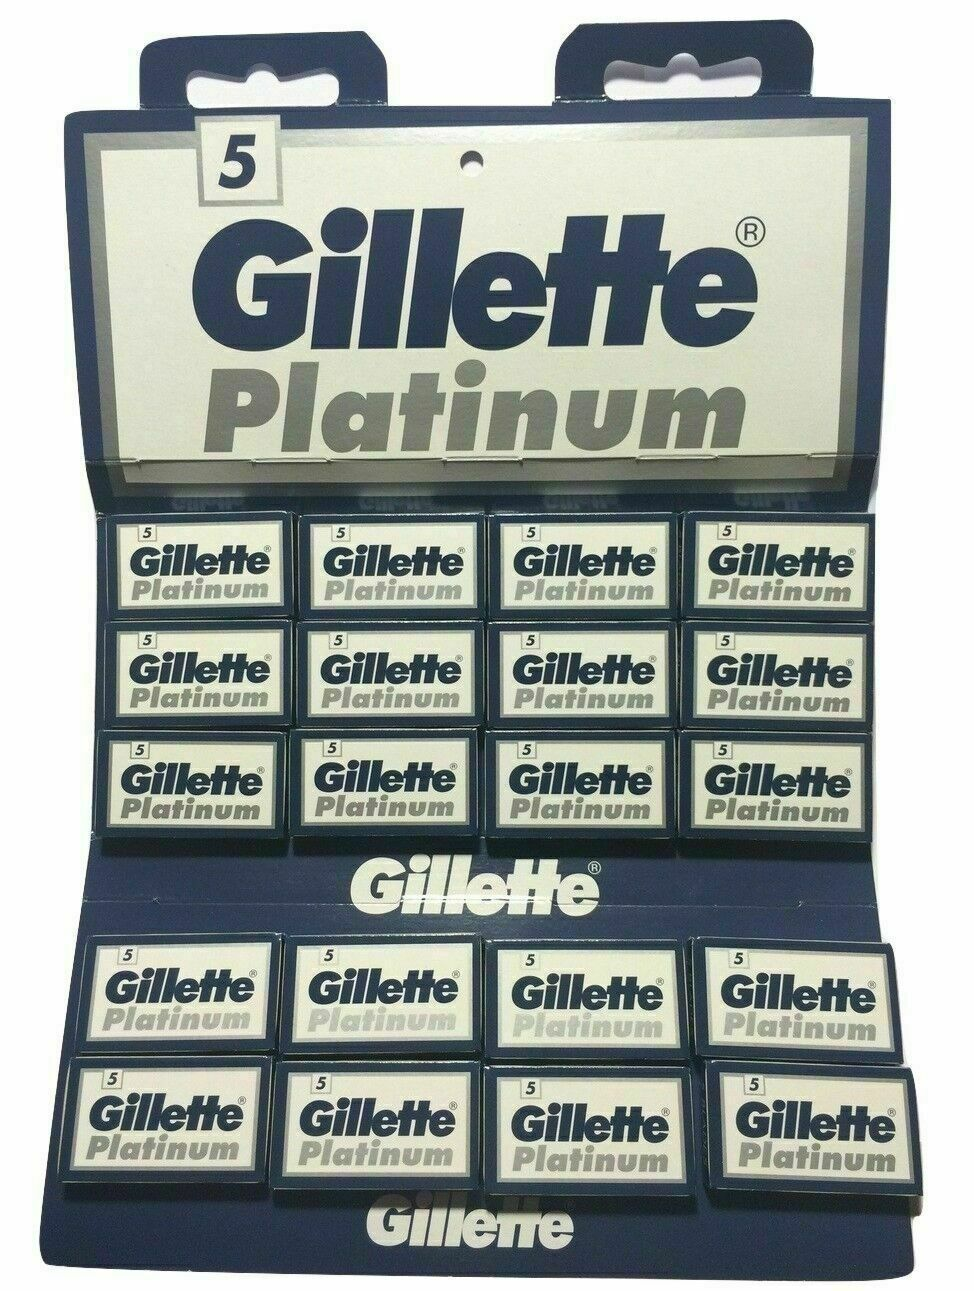 100 platinum double edge razor blades